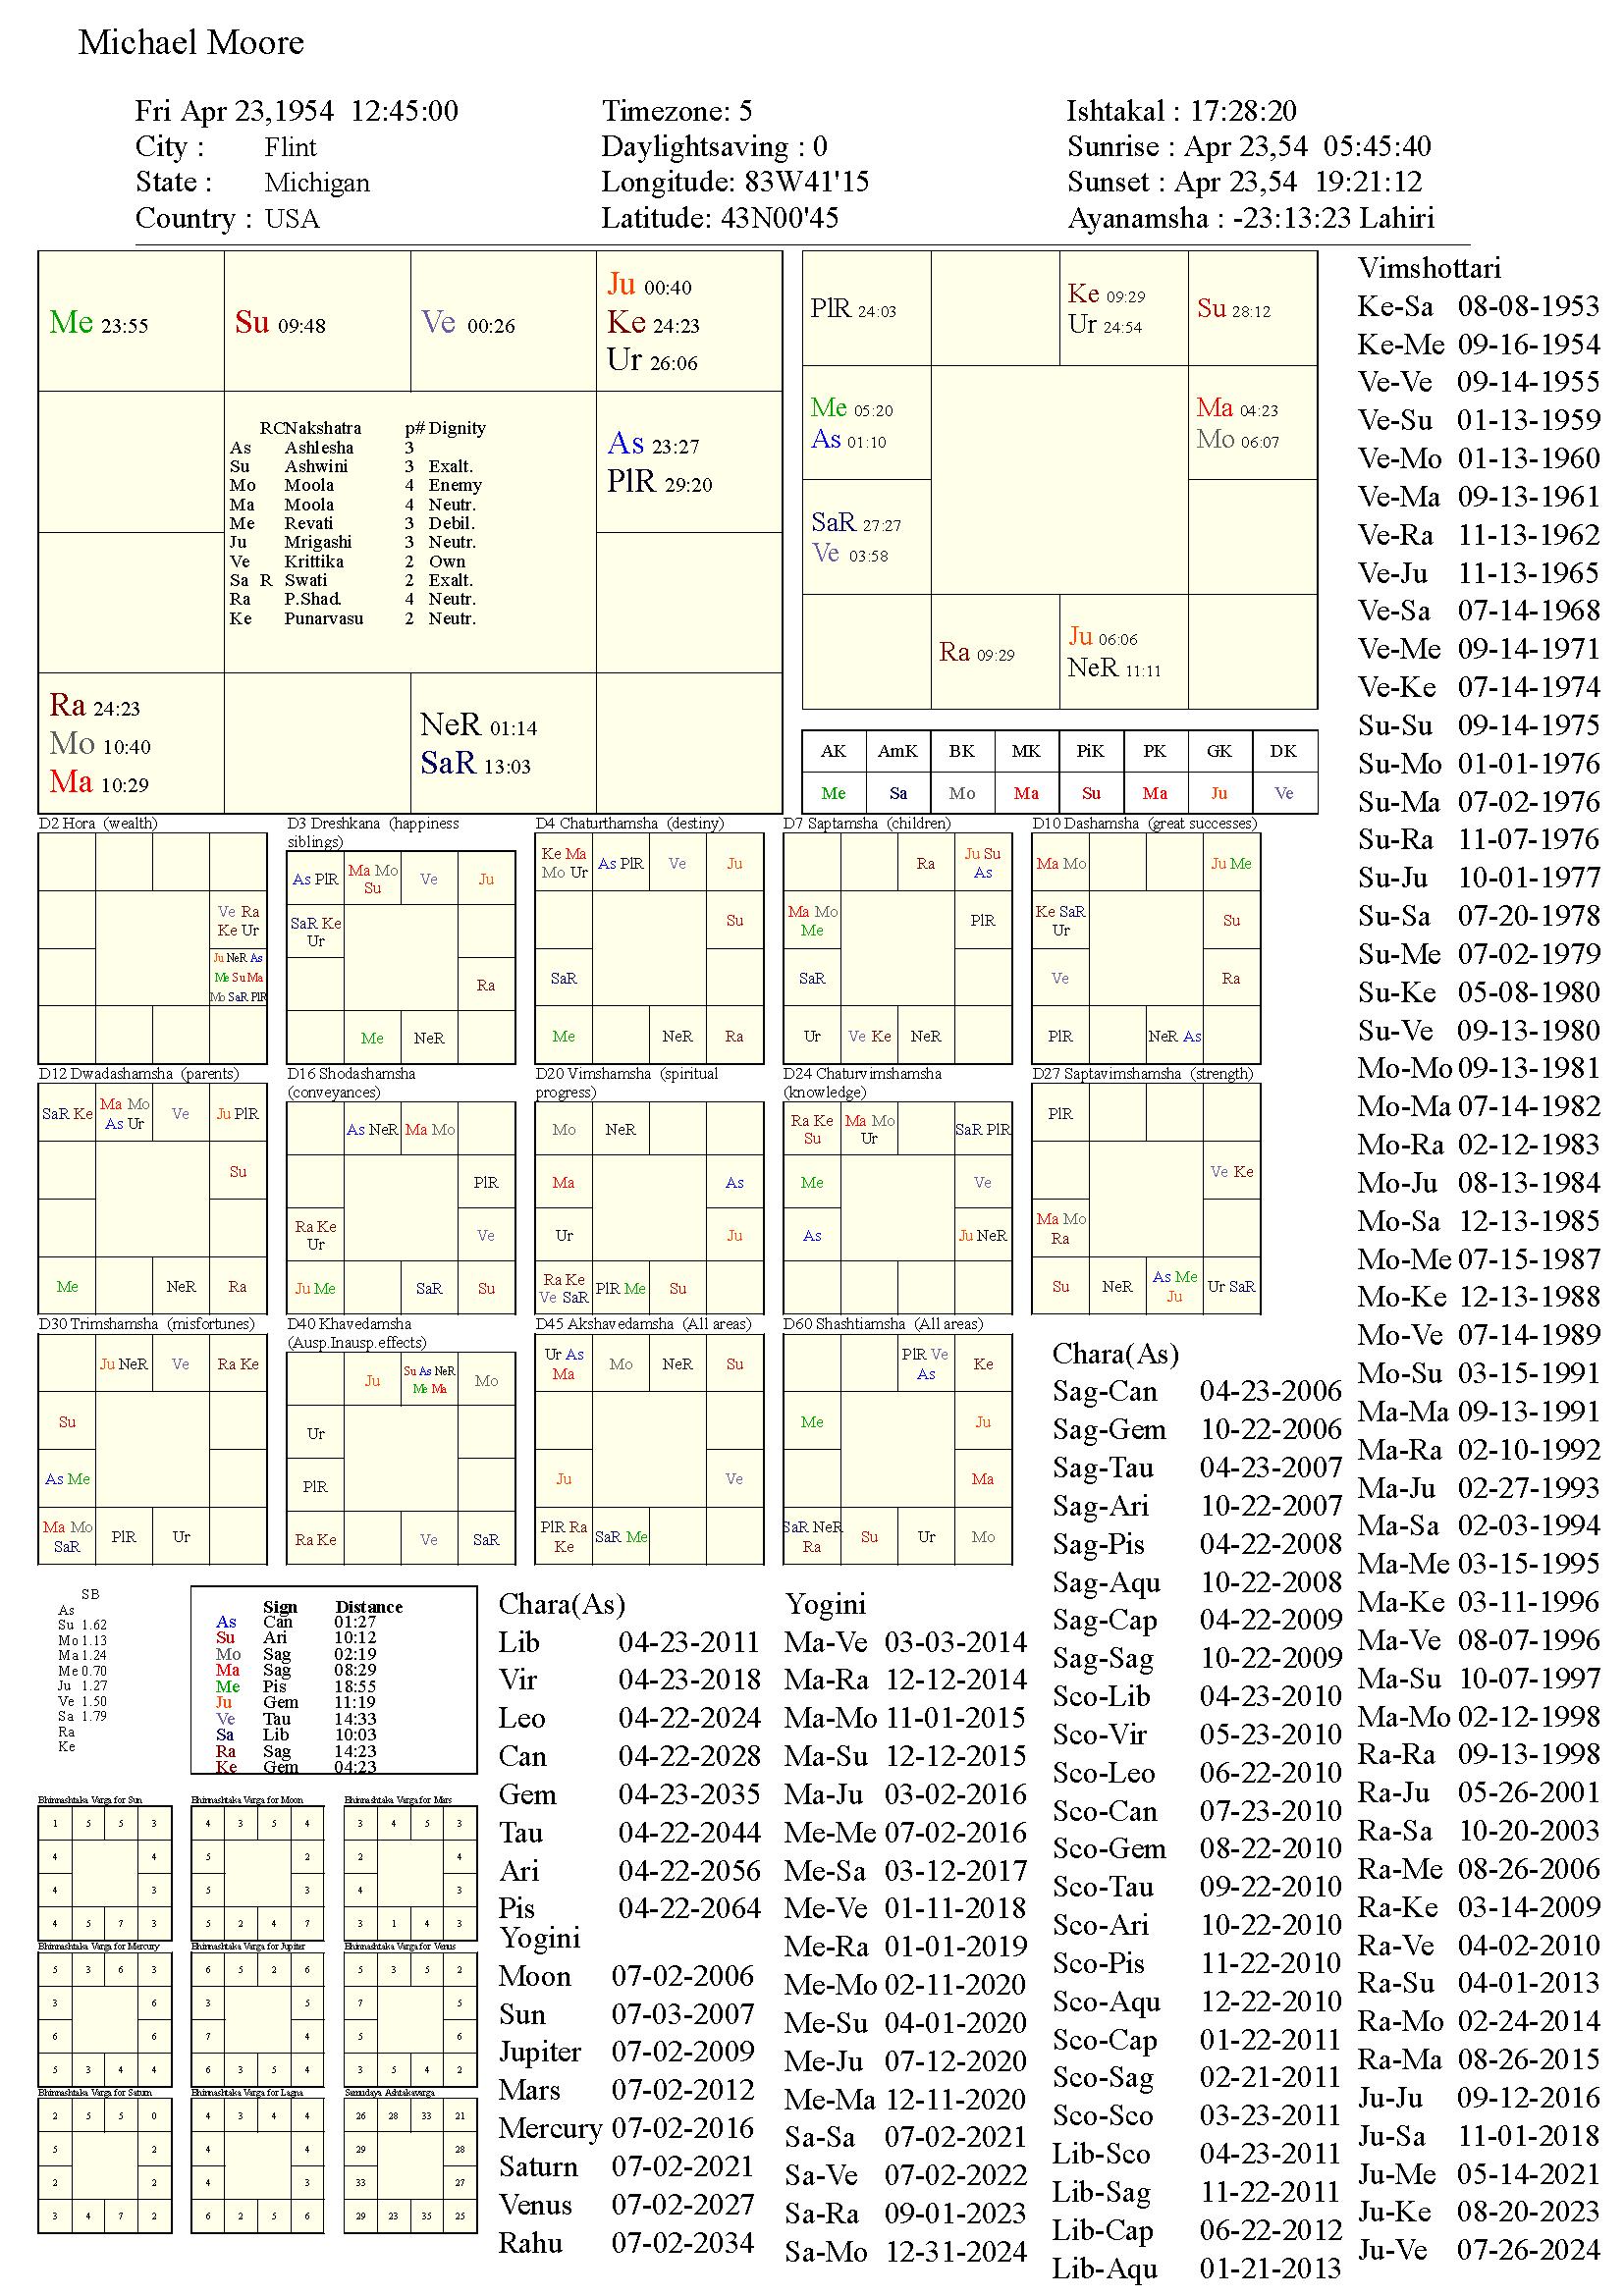 michaelmoore_chart